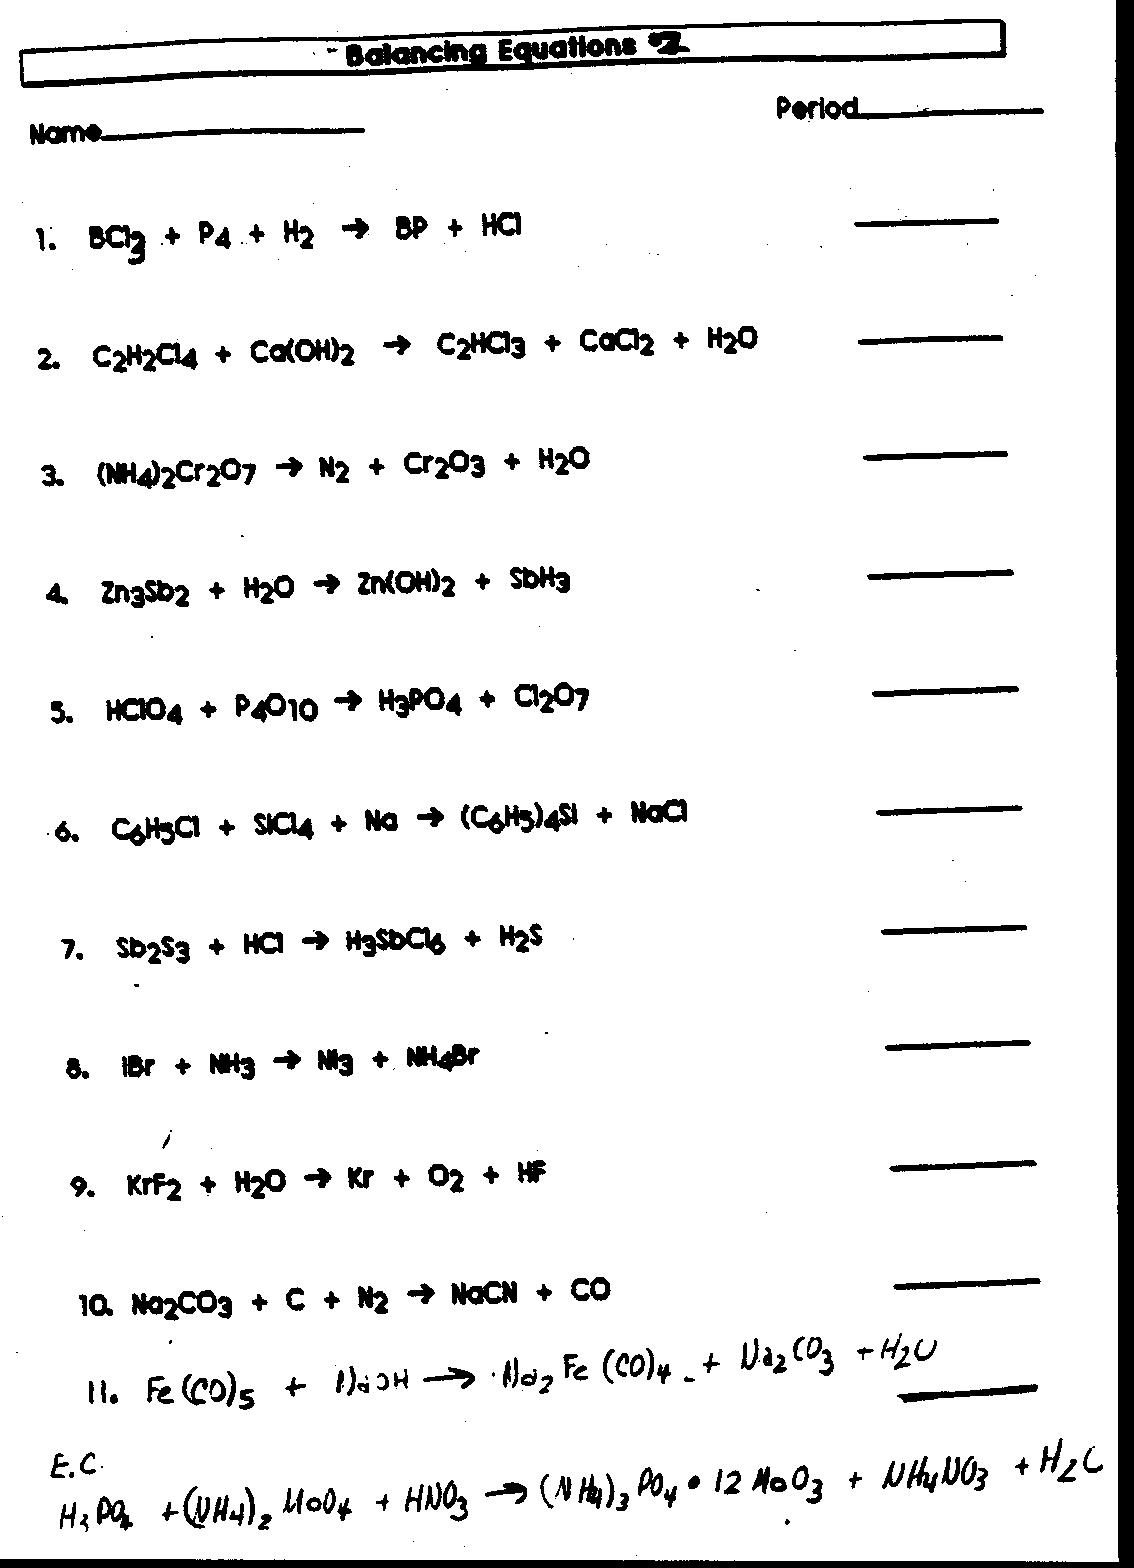 Worksheets. Balancing Chemical Equations Worksheet Answer Key H2 ...